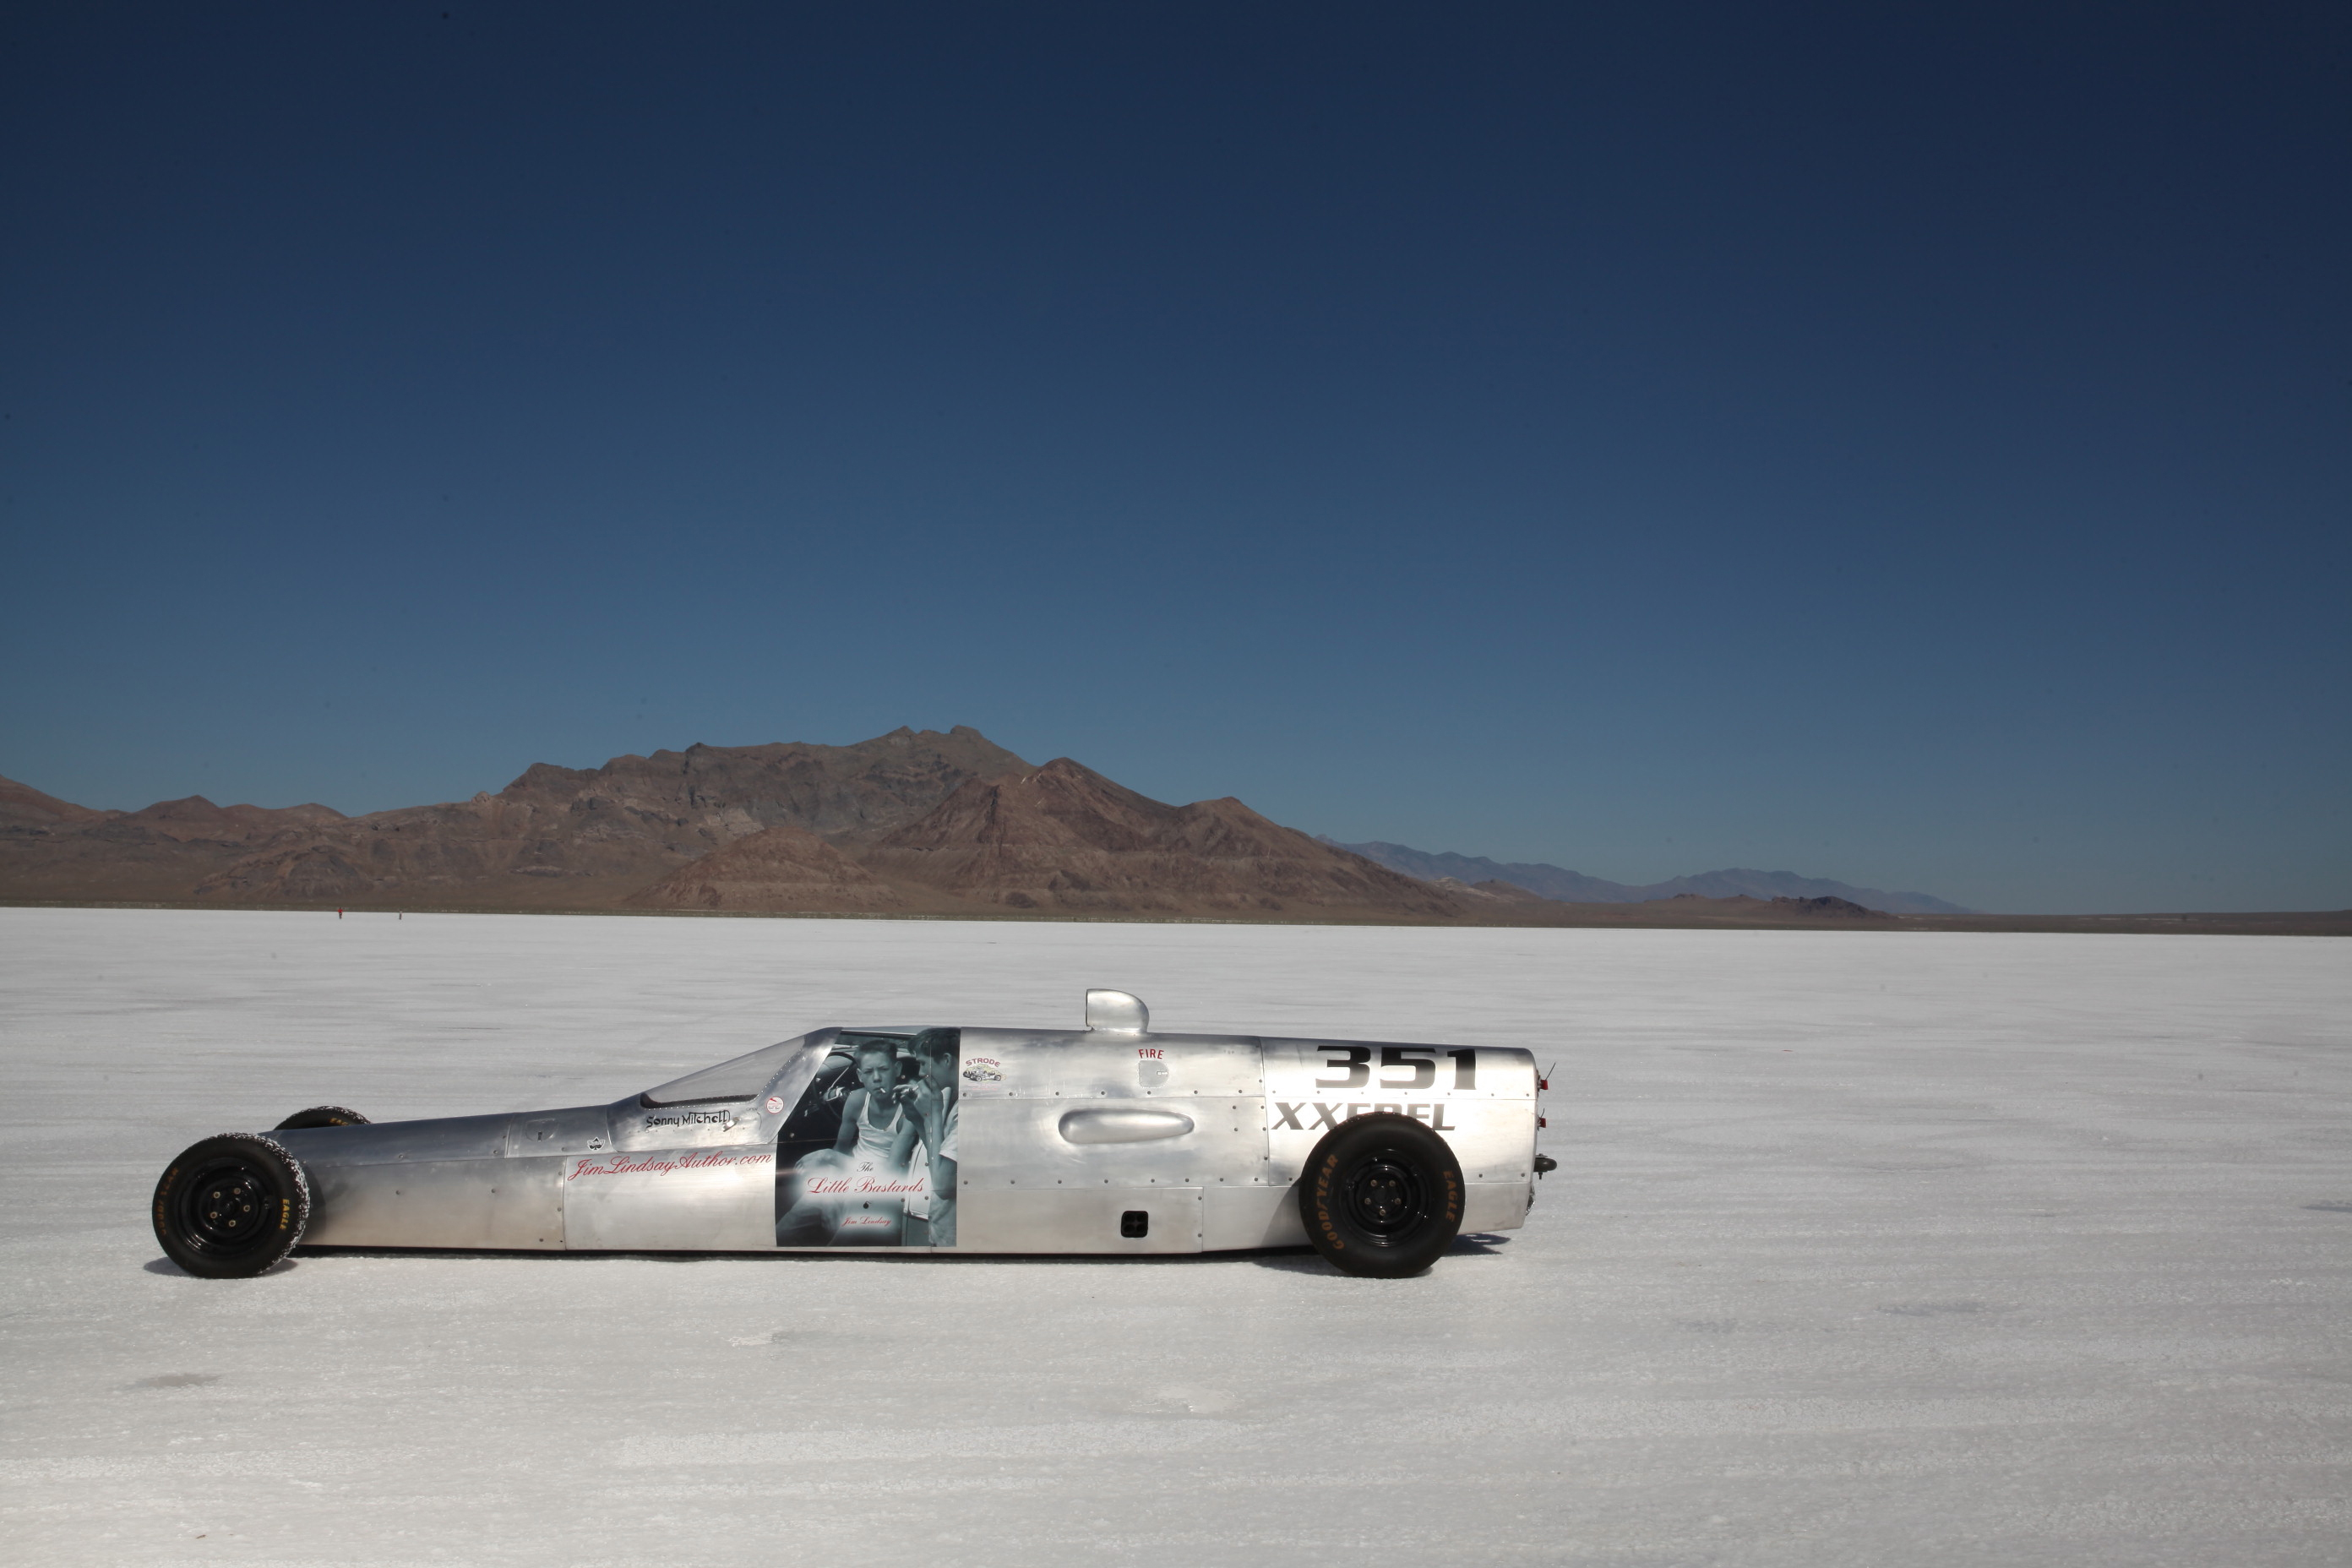 Bonneville Salt Flats: Learning How